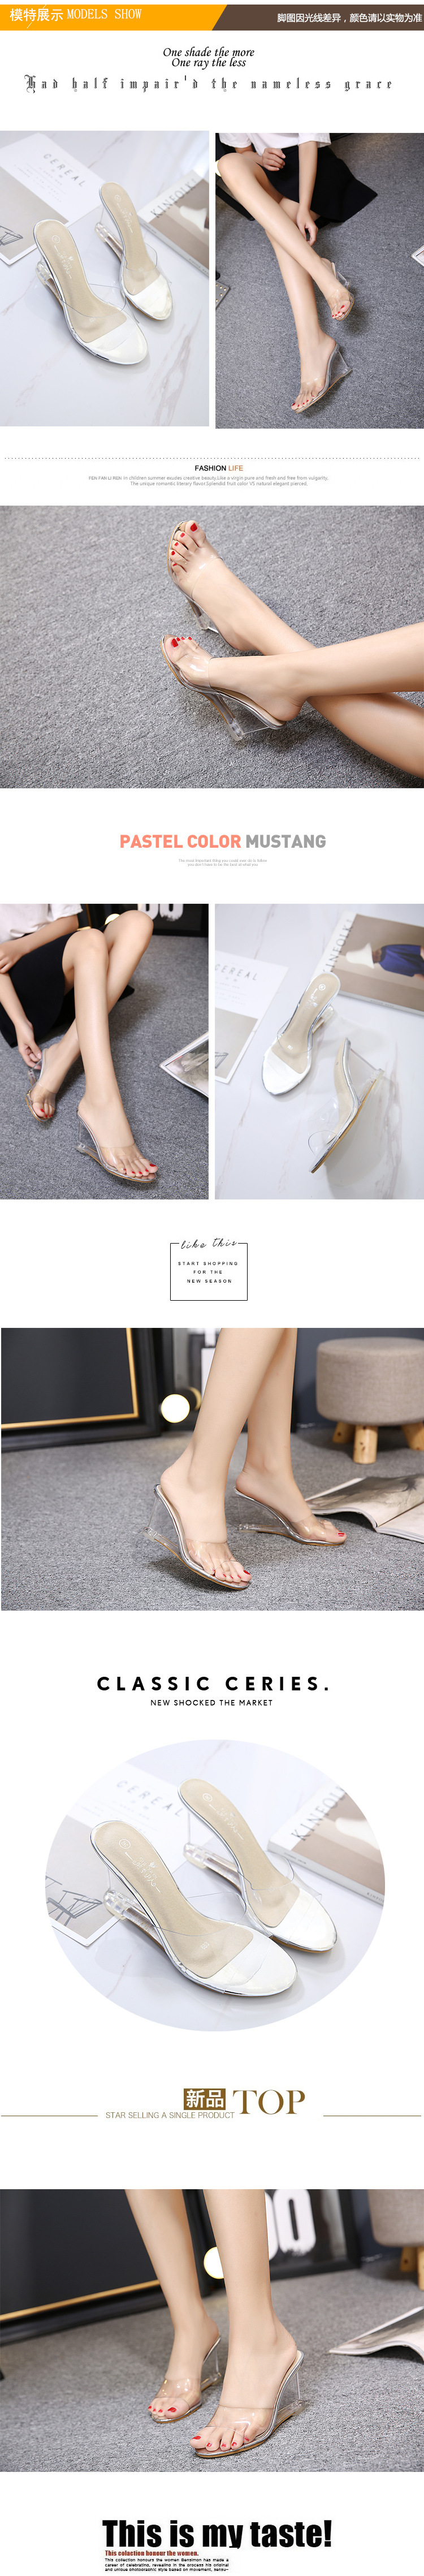 HTB1fXHDdi6guuRjy0Fmq6y0DXXaK HOKSZVY Women Slipper High Heels Summer Summer Women's Shoes Word Buckle Simple Wedge Sandals Transparent Clear Shoes LFD-833-2